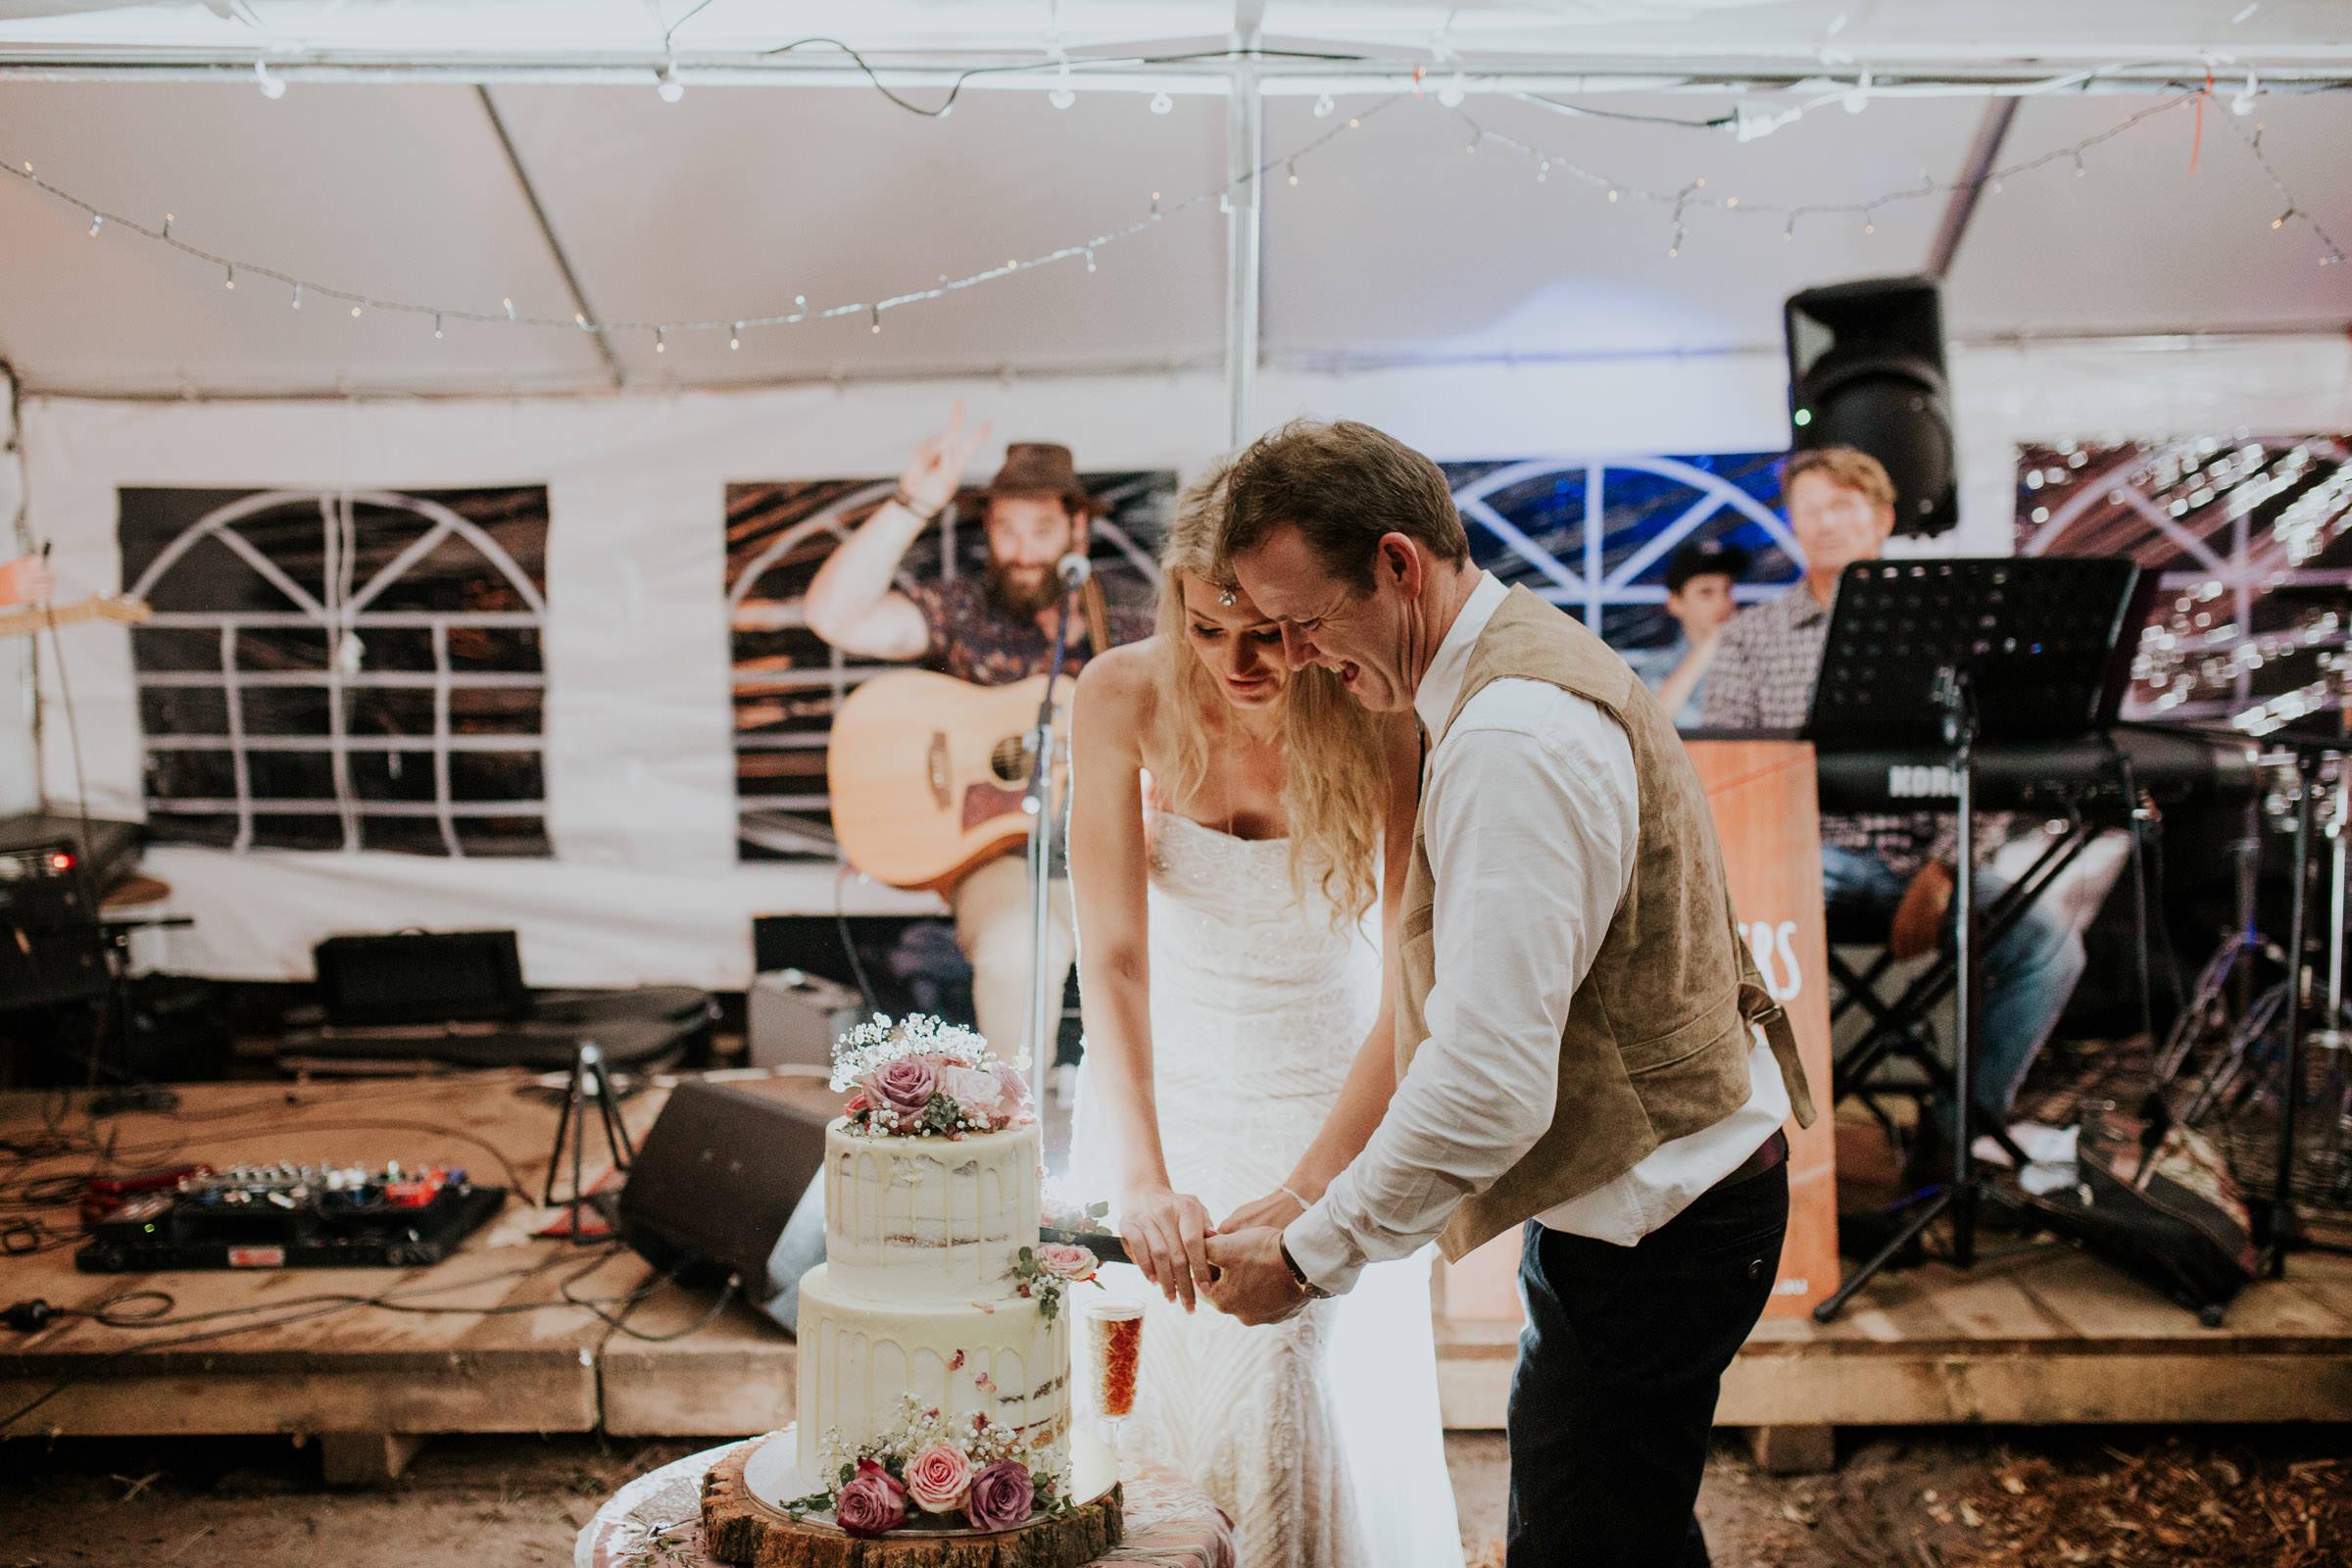 Emma+John+Far+South+Coast+Wedding+Festivl+Glamping+Bush-159.jpg